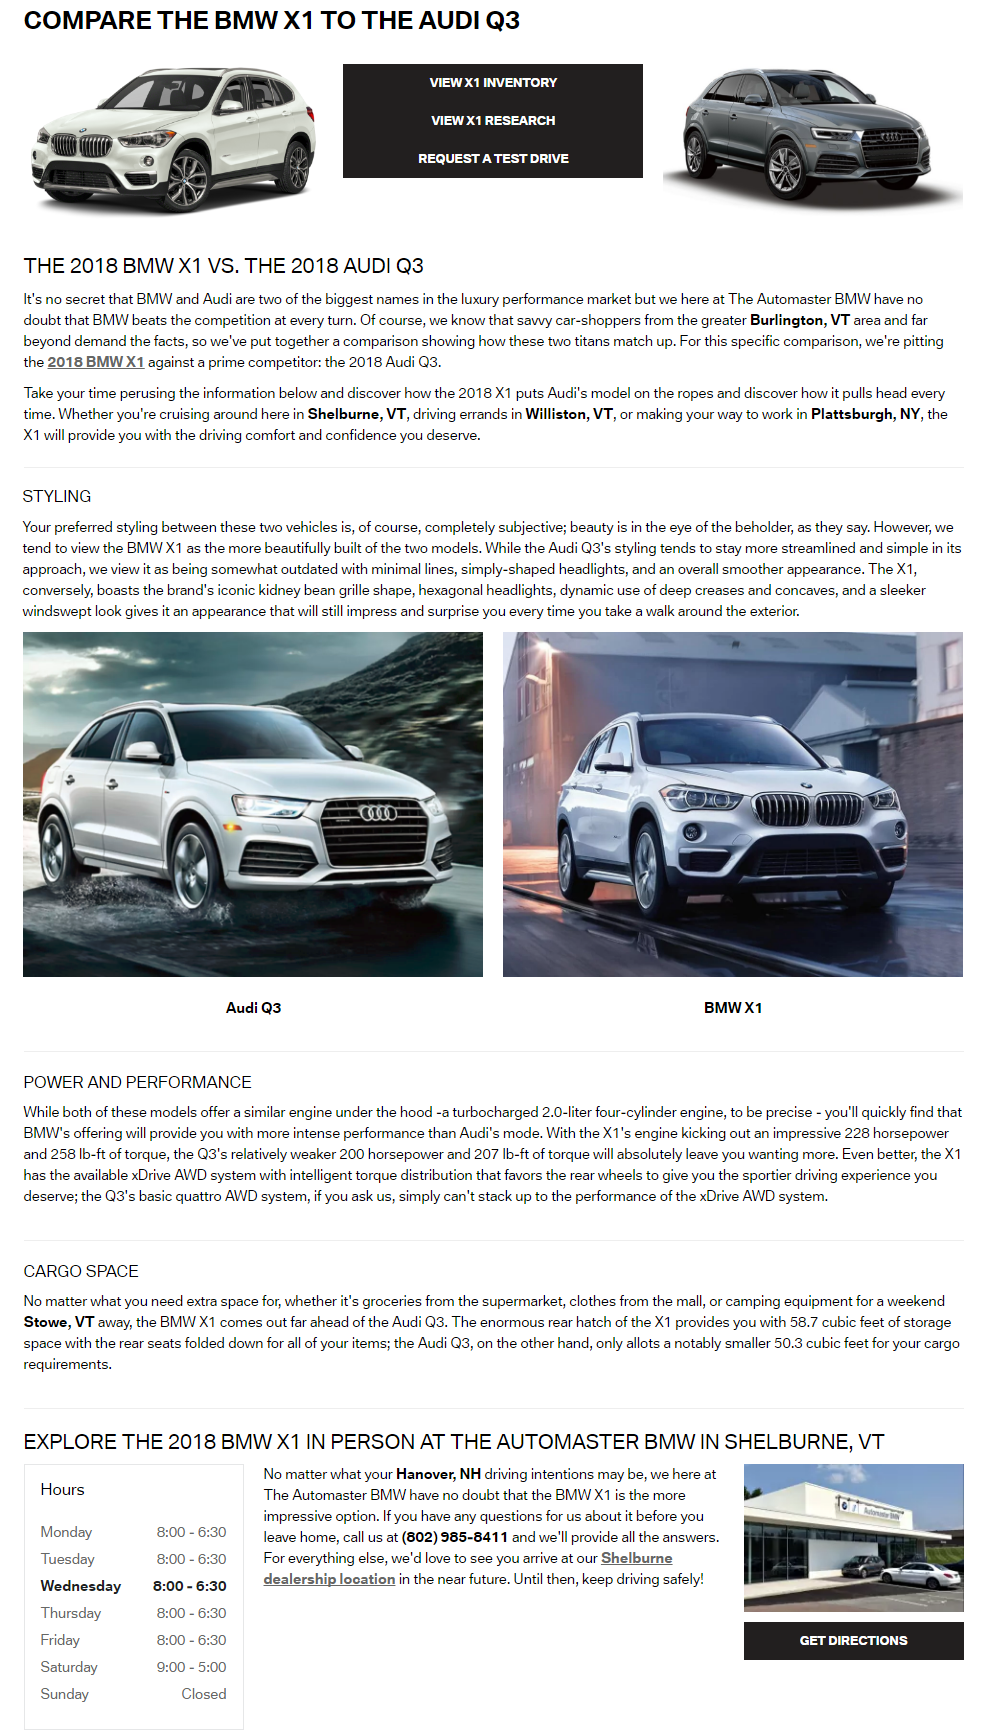 The Automaster Bmw 2018 X1 Vs Audi Q3 Comparison Cameron Glenn Bock